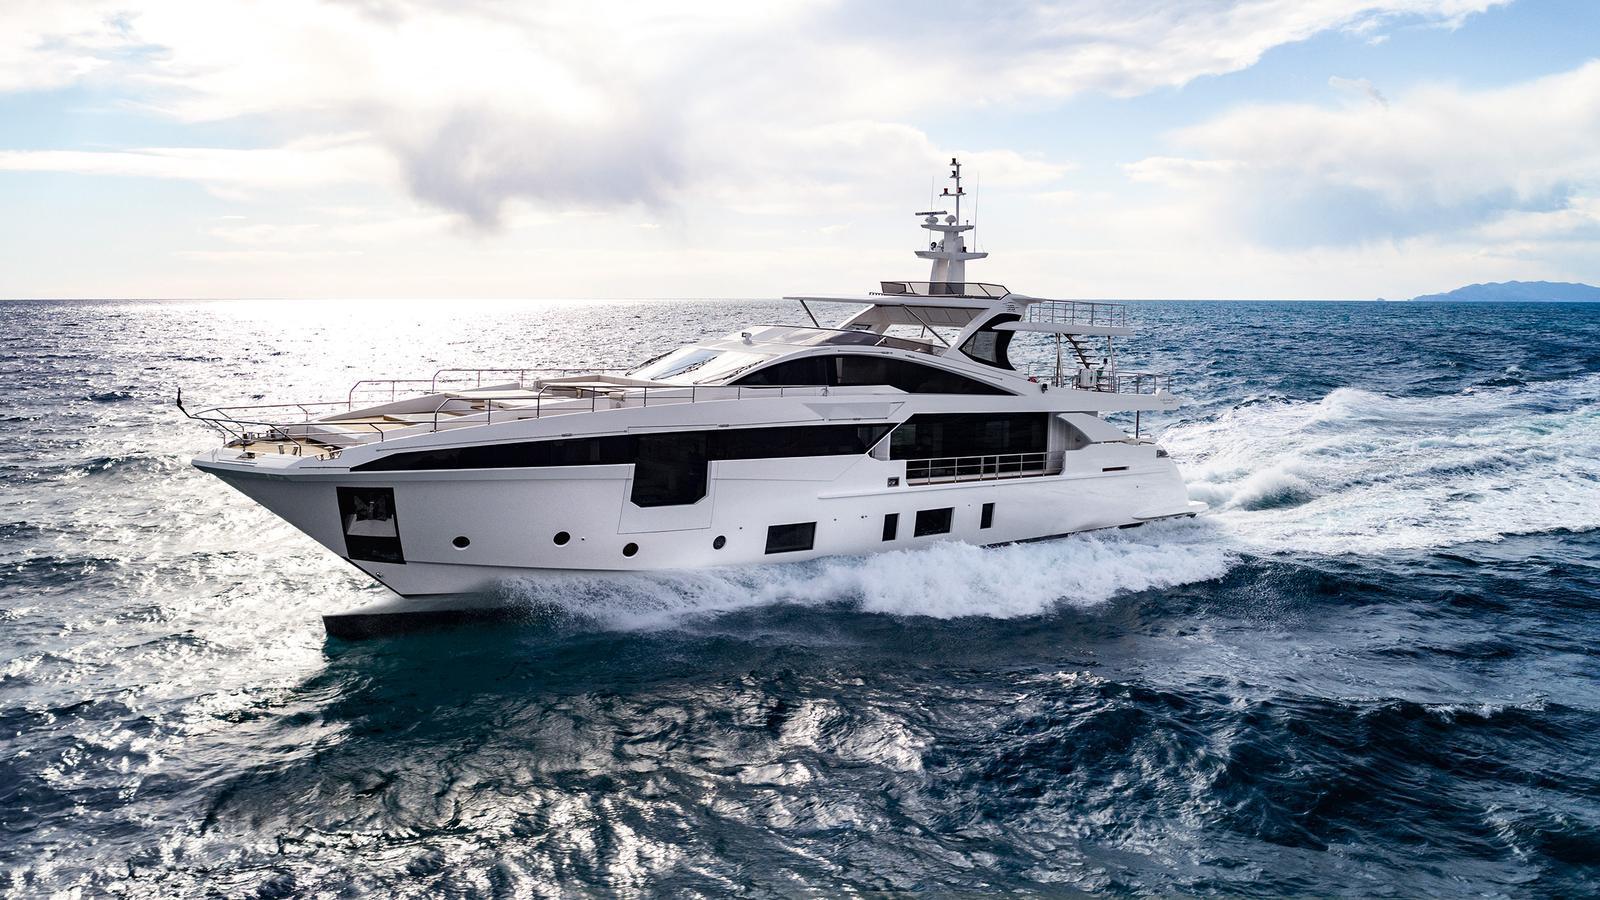 Grande 35 Metri motoryacht azimut yachts 35m 2020 half profile sistership